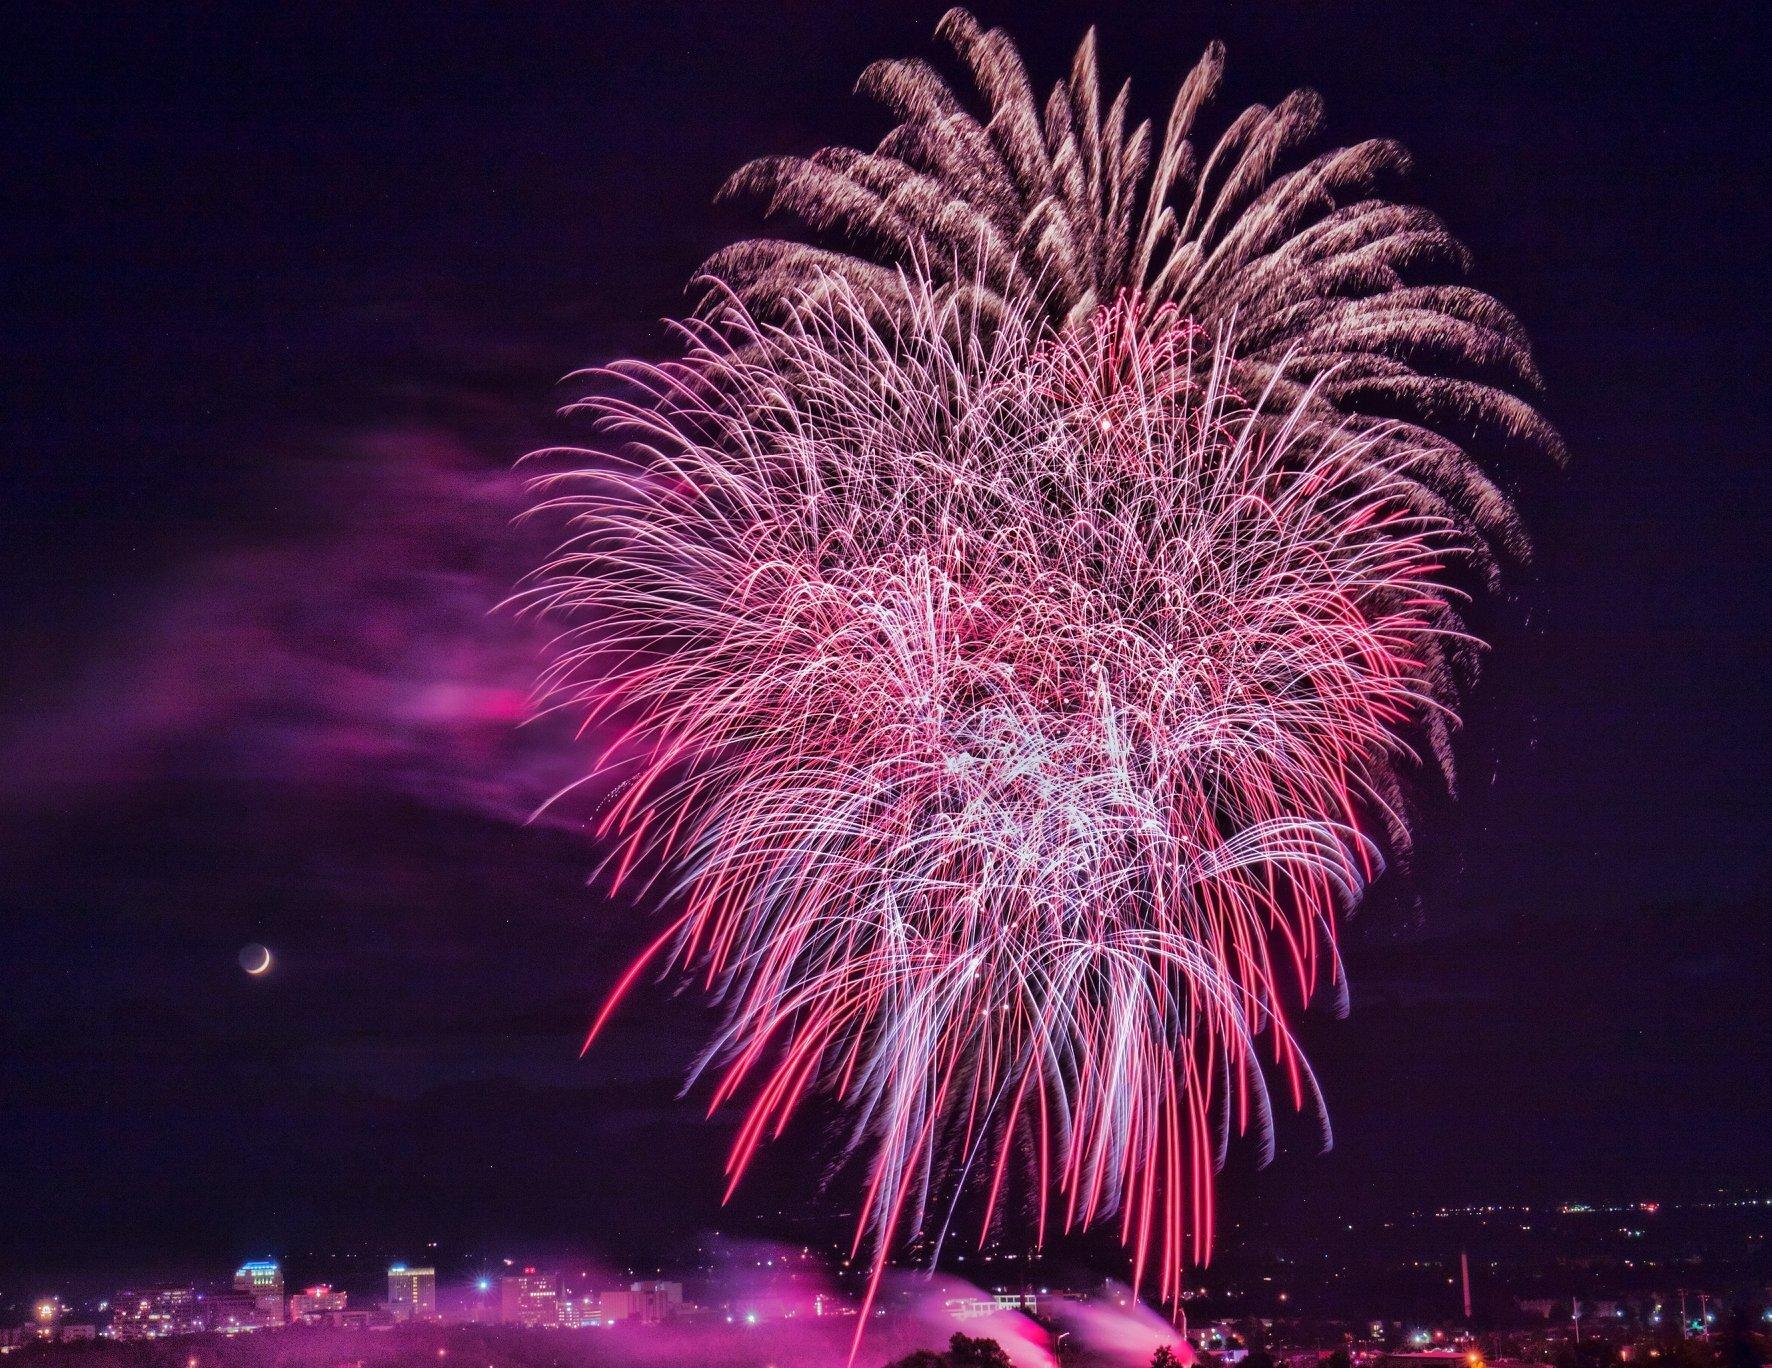 Memorial Park Fireworks